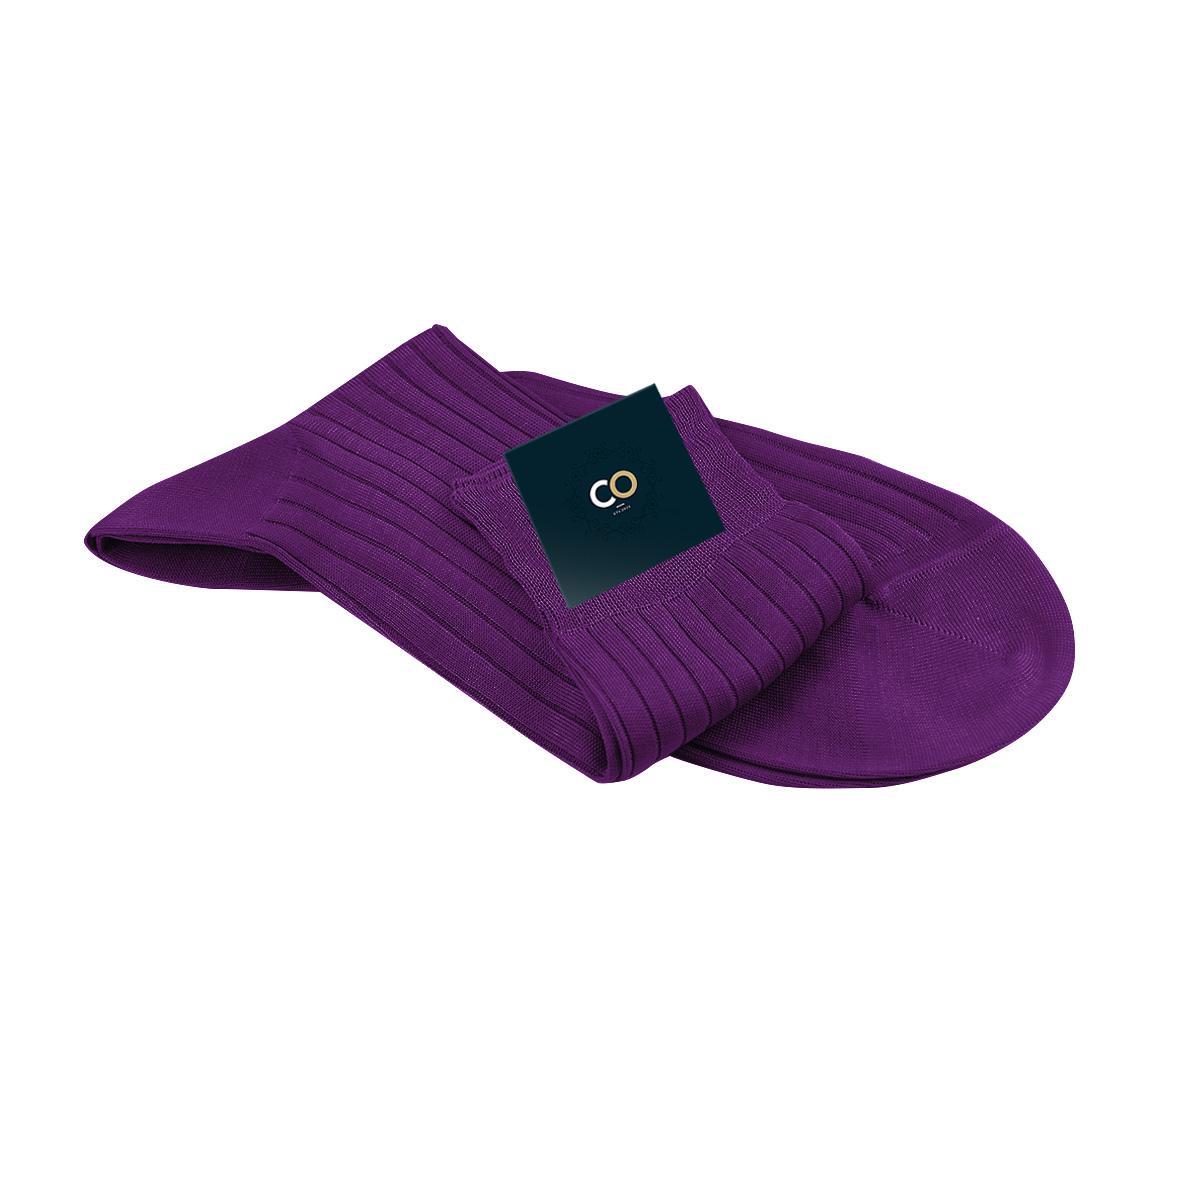 Chaussette Hyper violet, Virgile